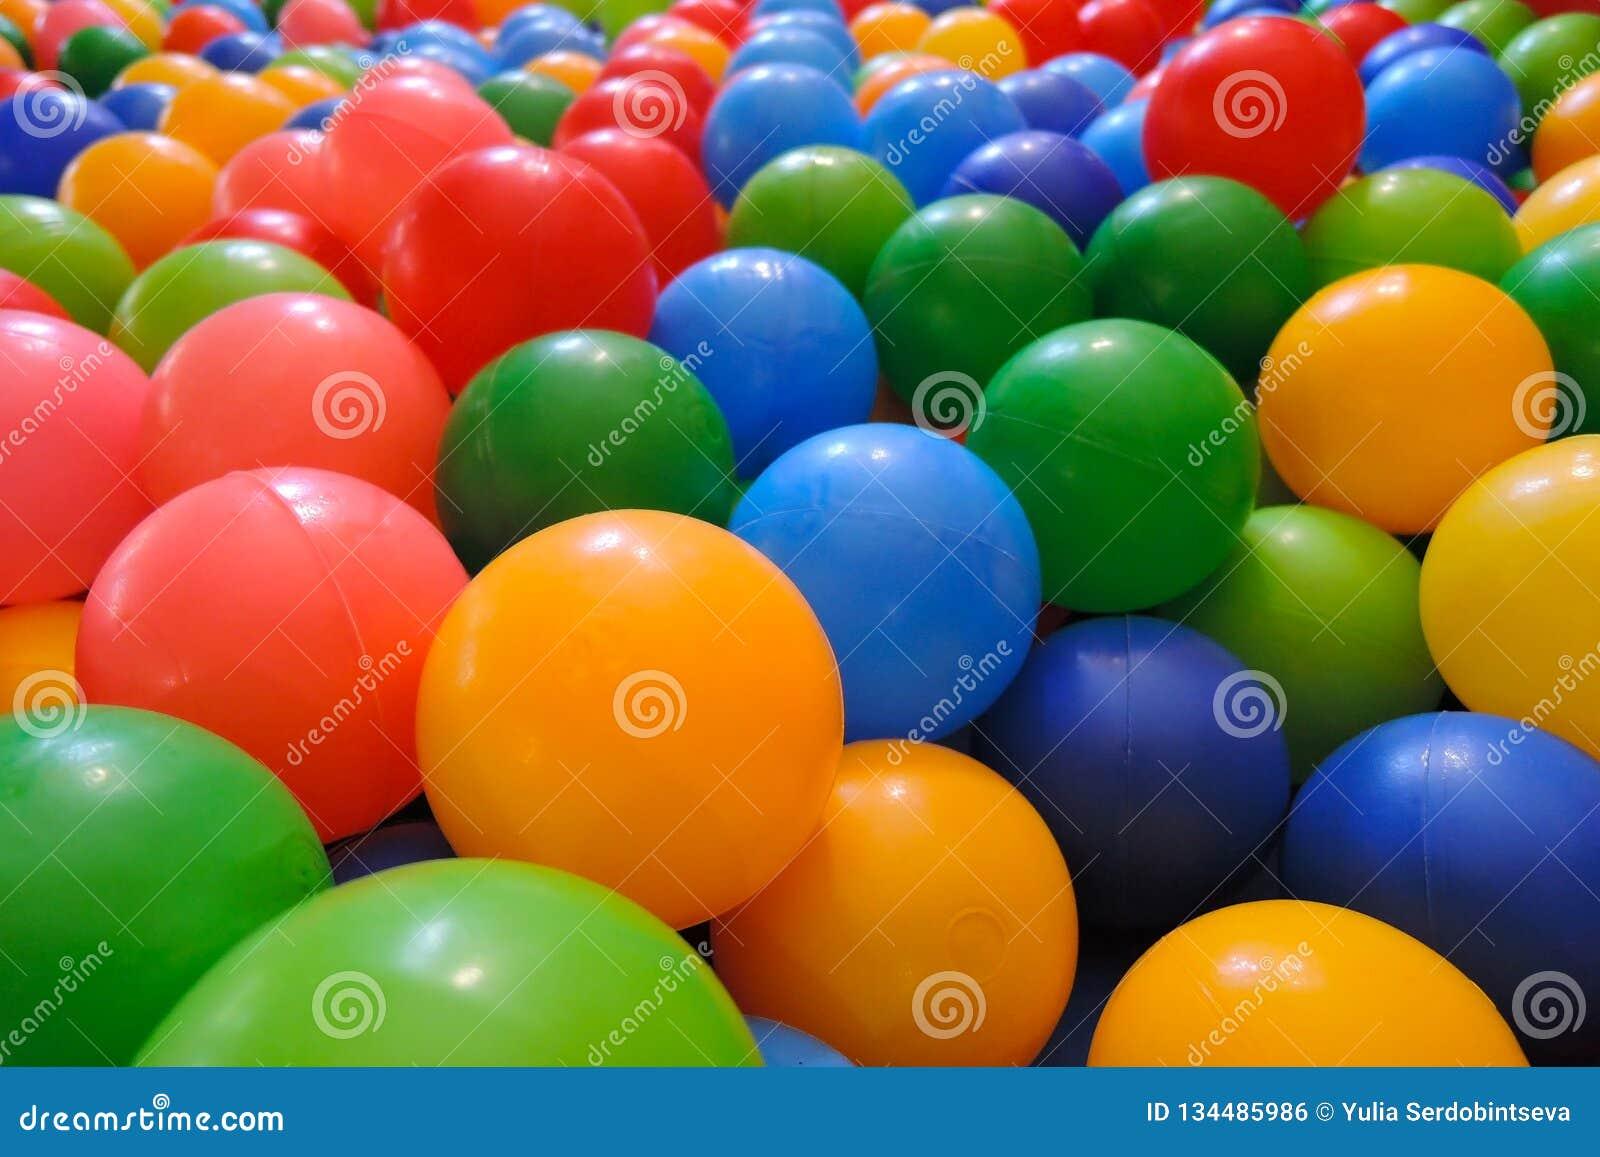 Mehrfarbige Plastikbälle für trockene Poolkinderunterhaltungsnahaufnahme